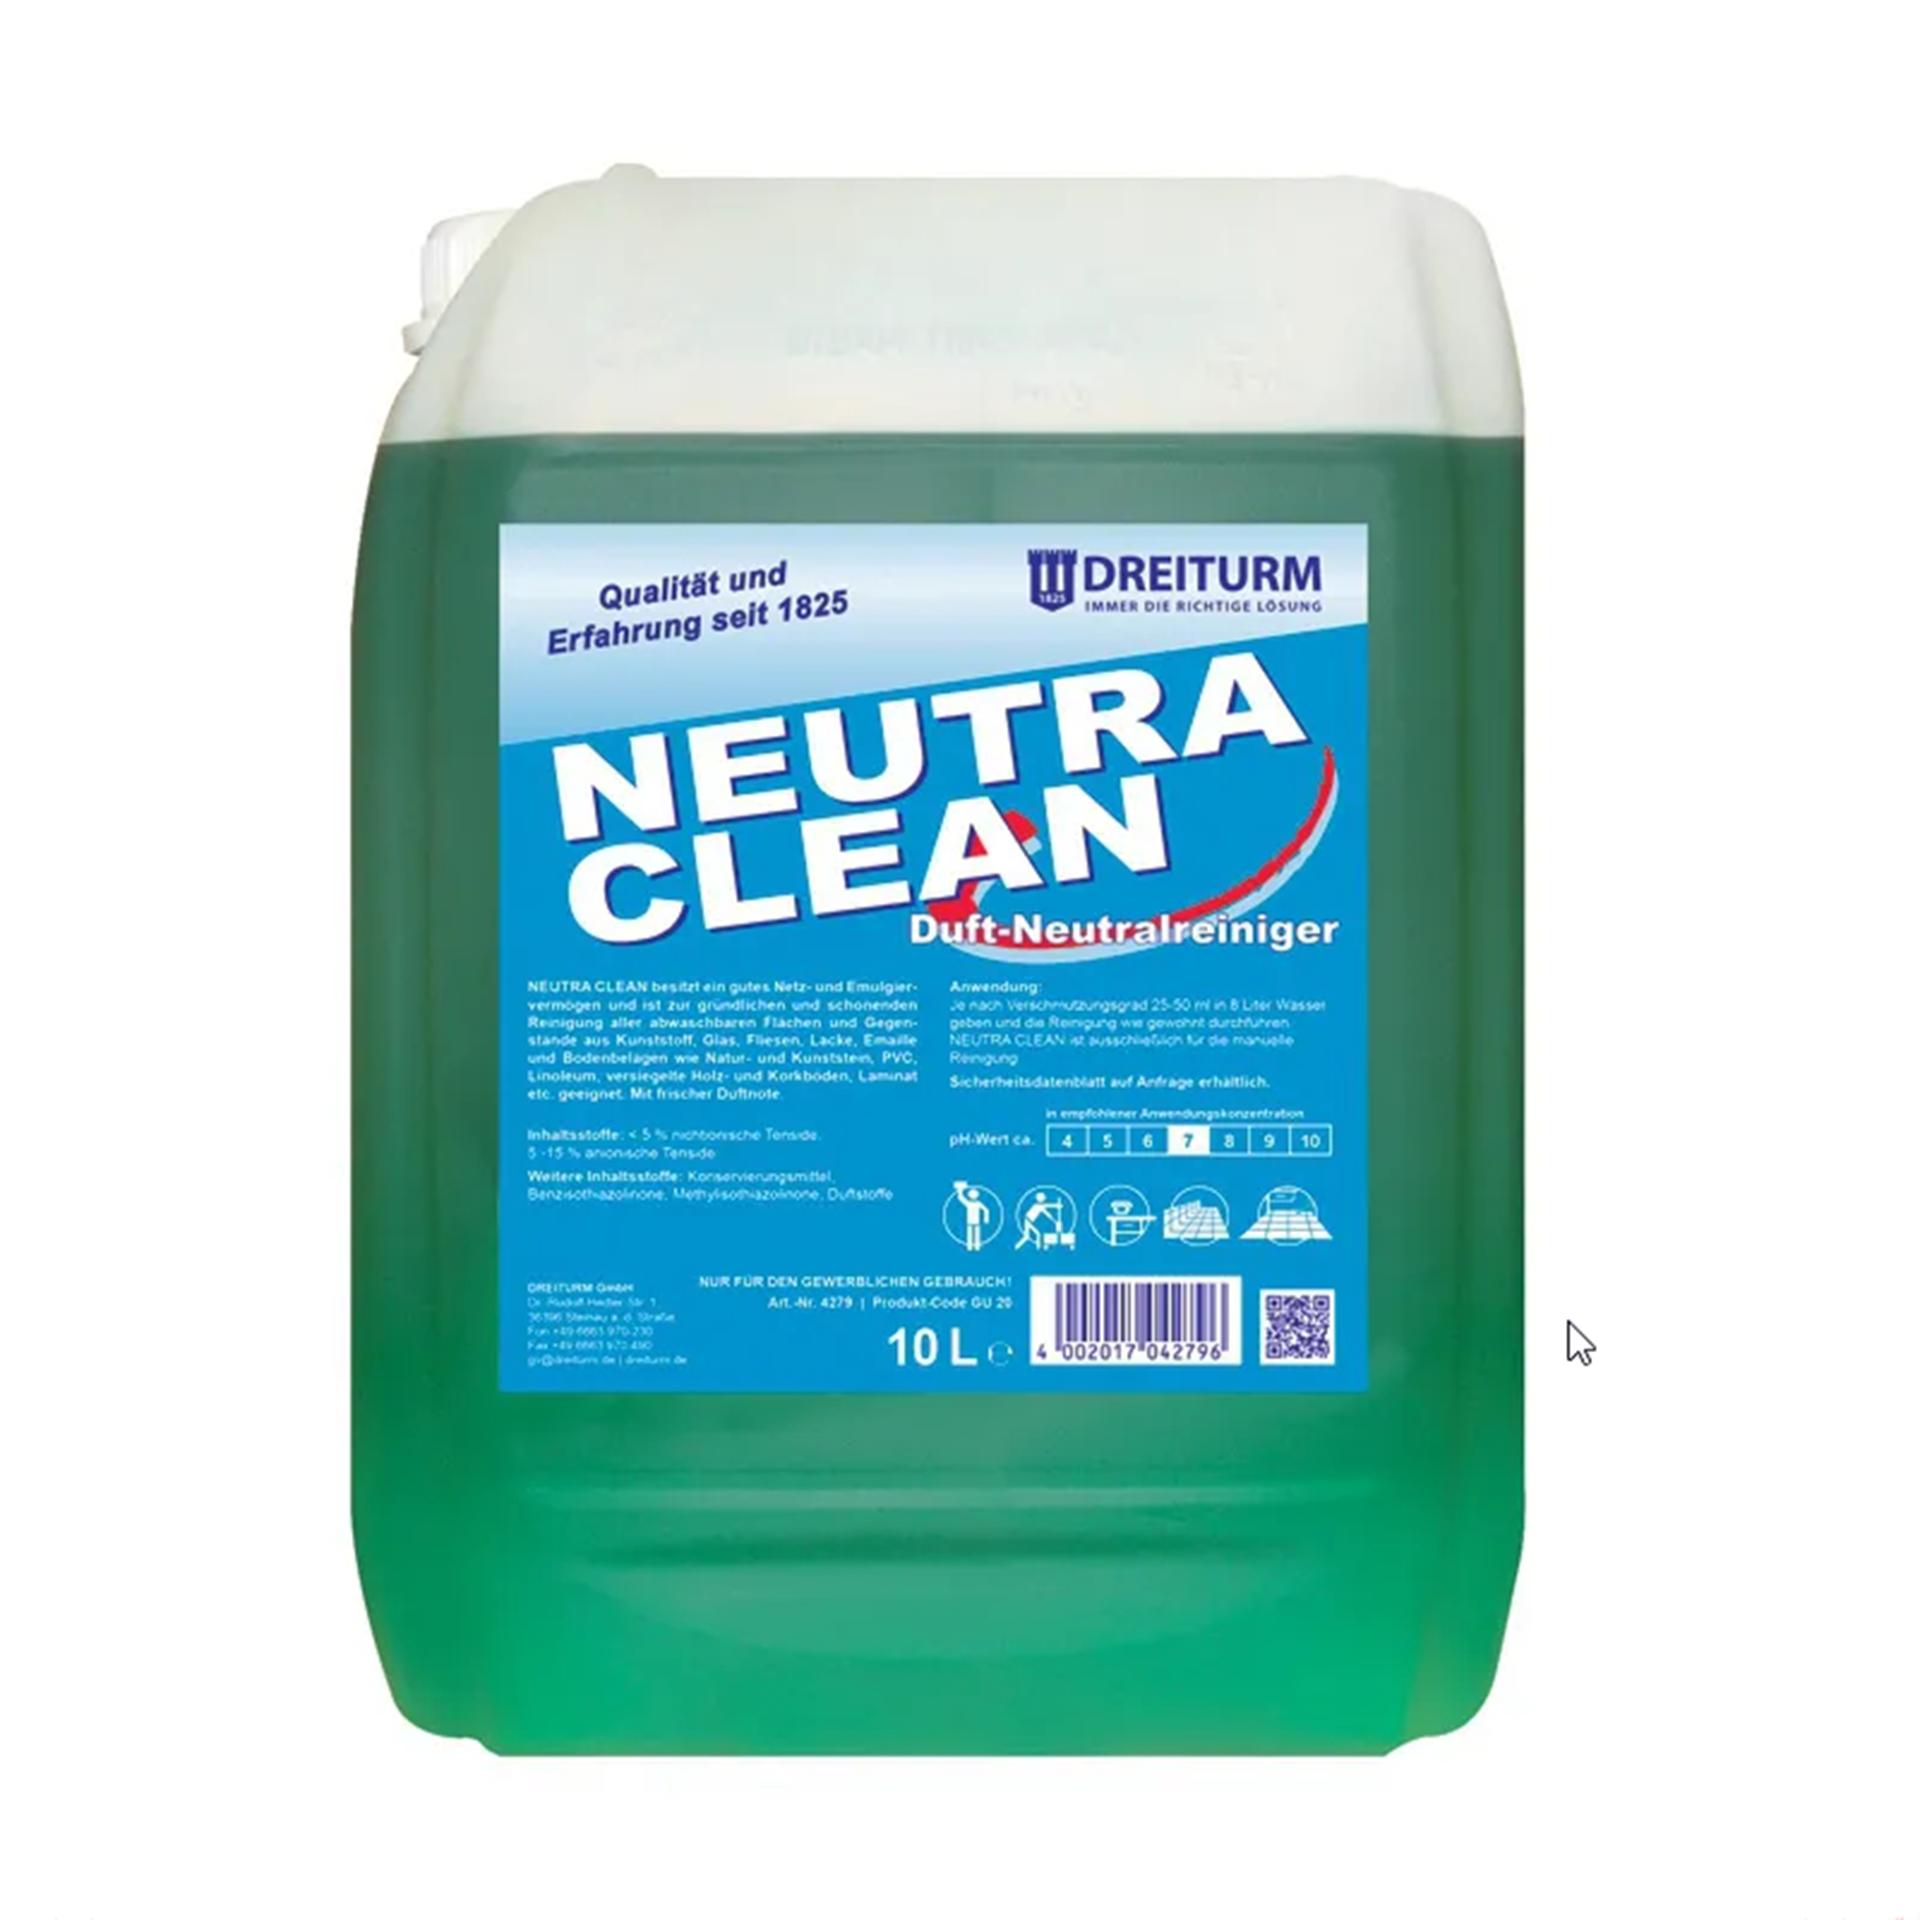 Dreiturm NEUTRA CLEAN Neutralreiniger - 10 l - Kanister